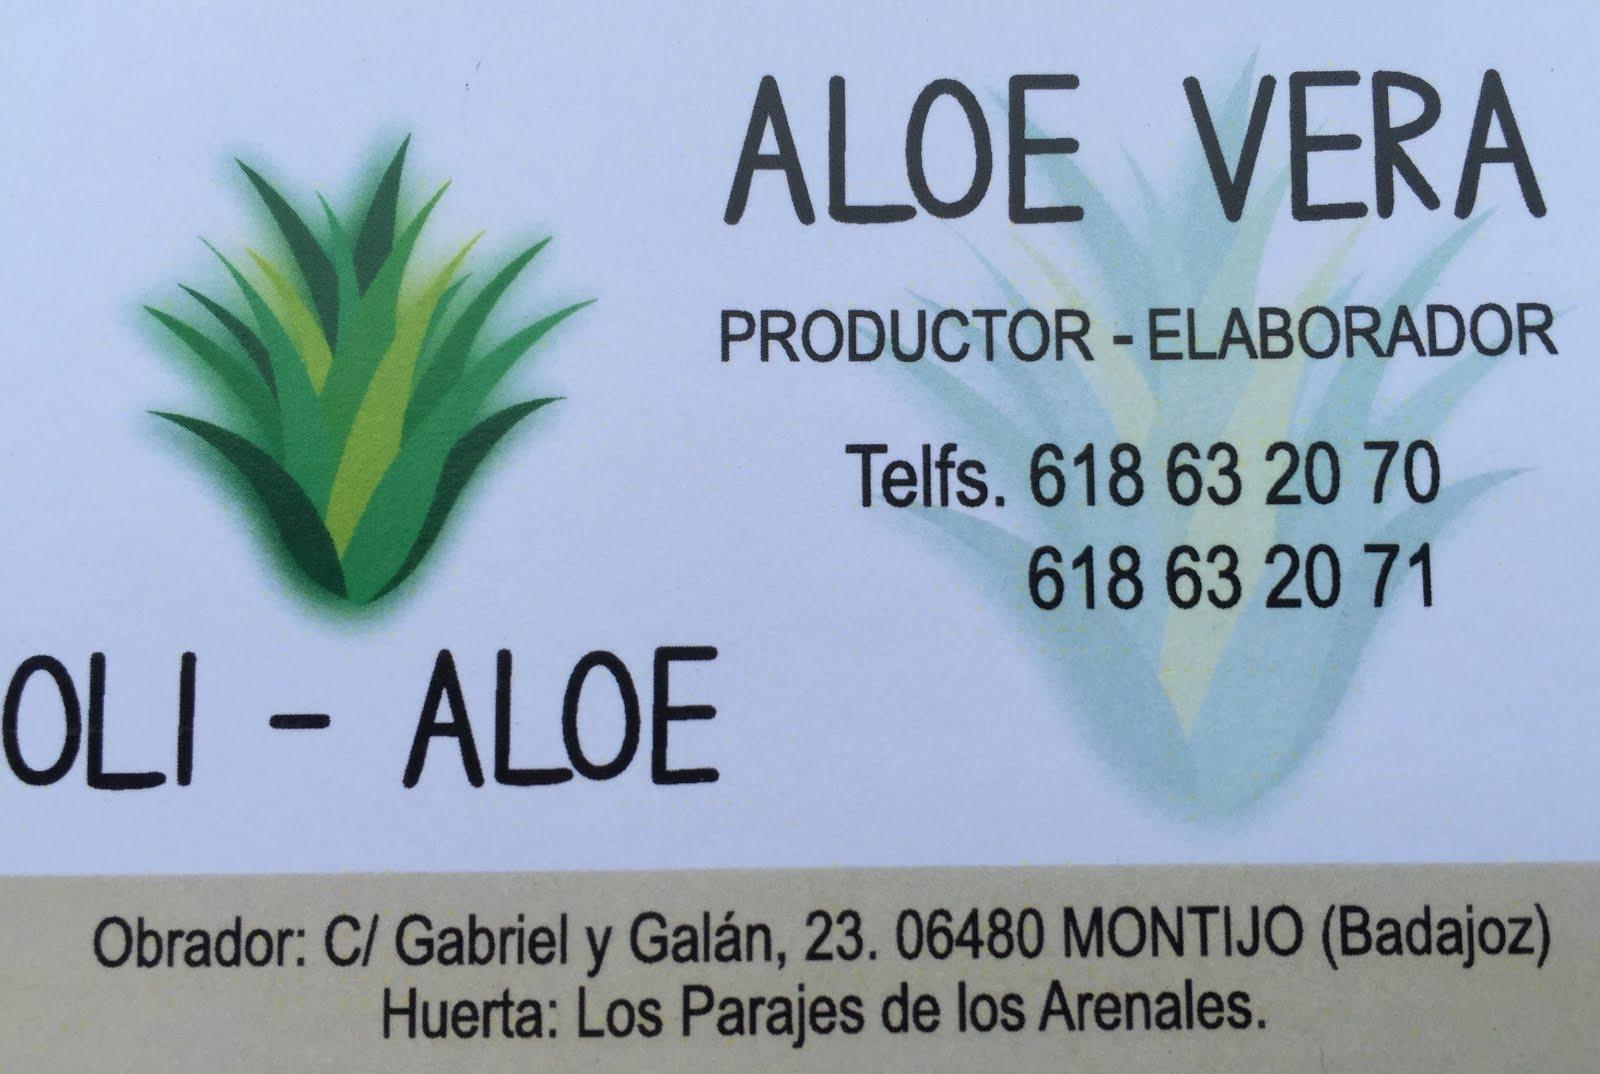 OLI - ALOE